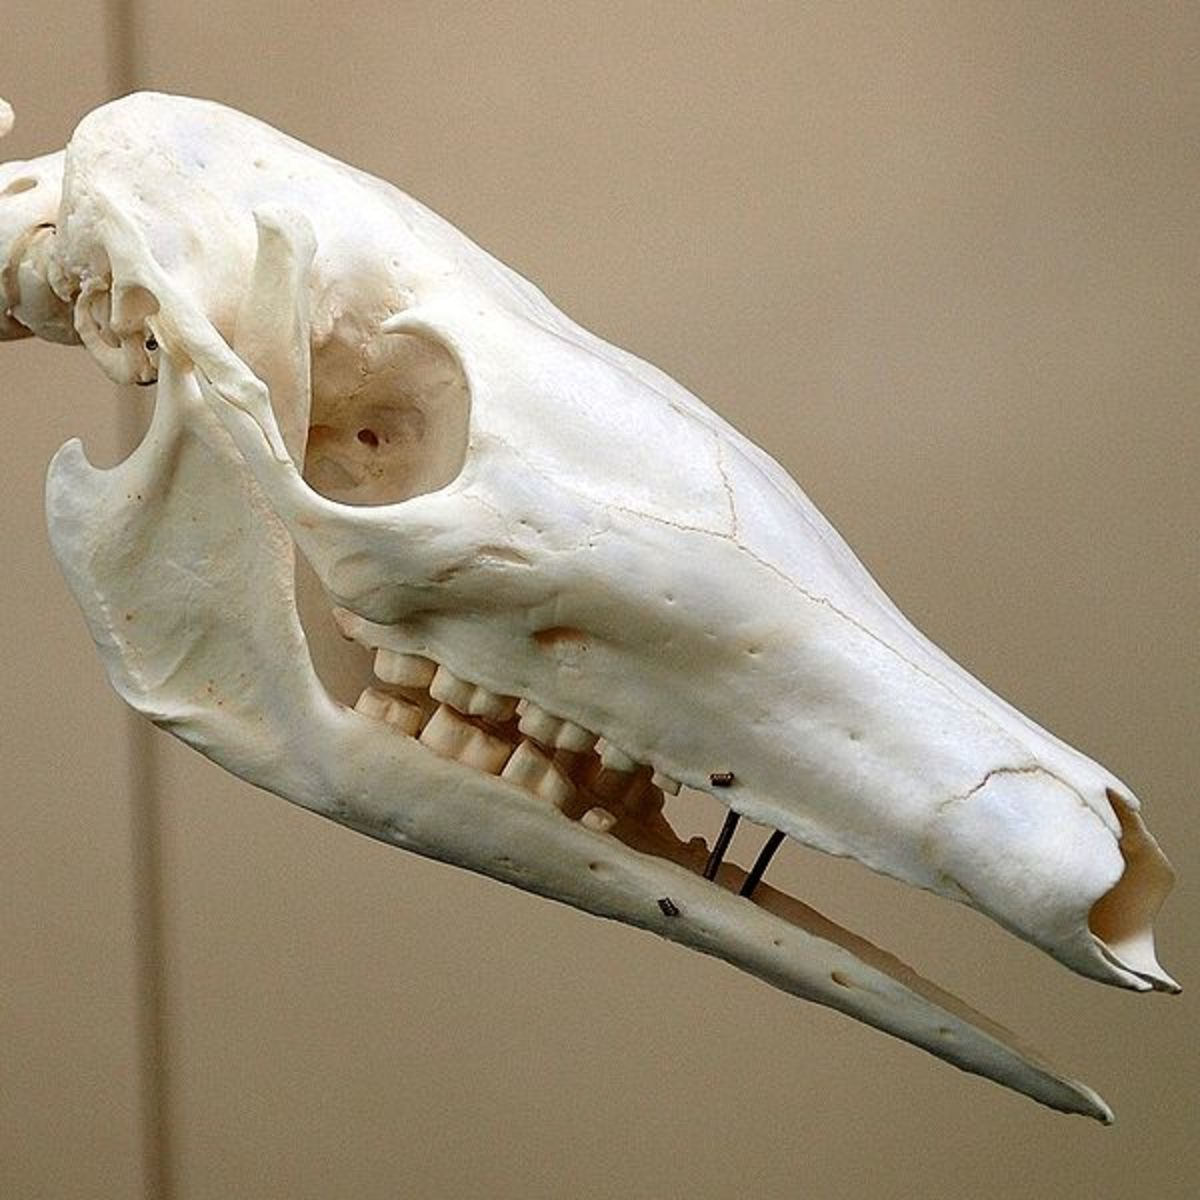 View of teeth in an aardvark skull